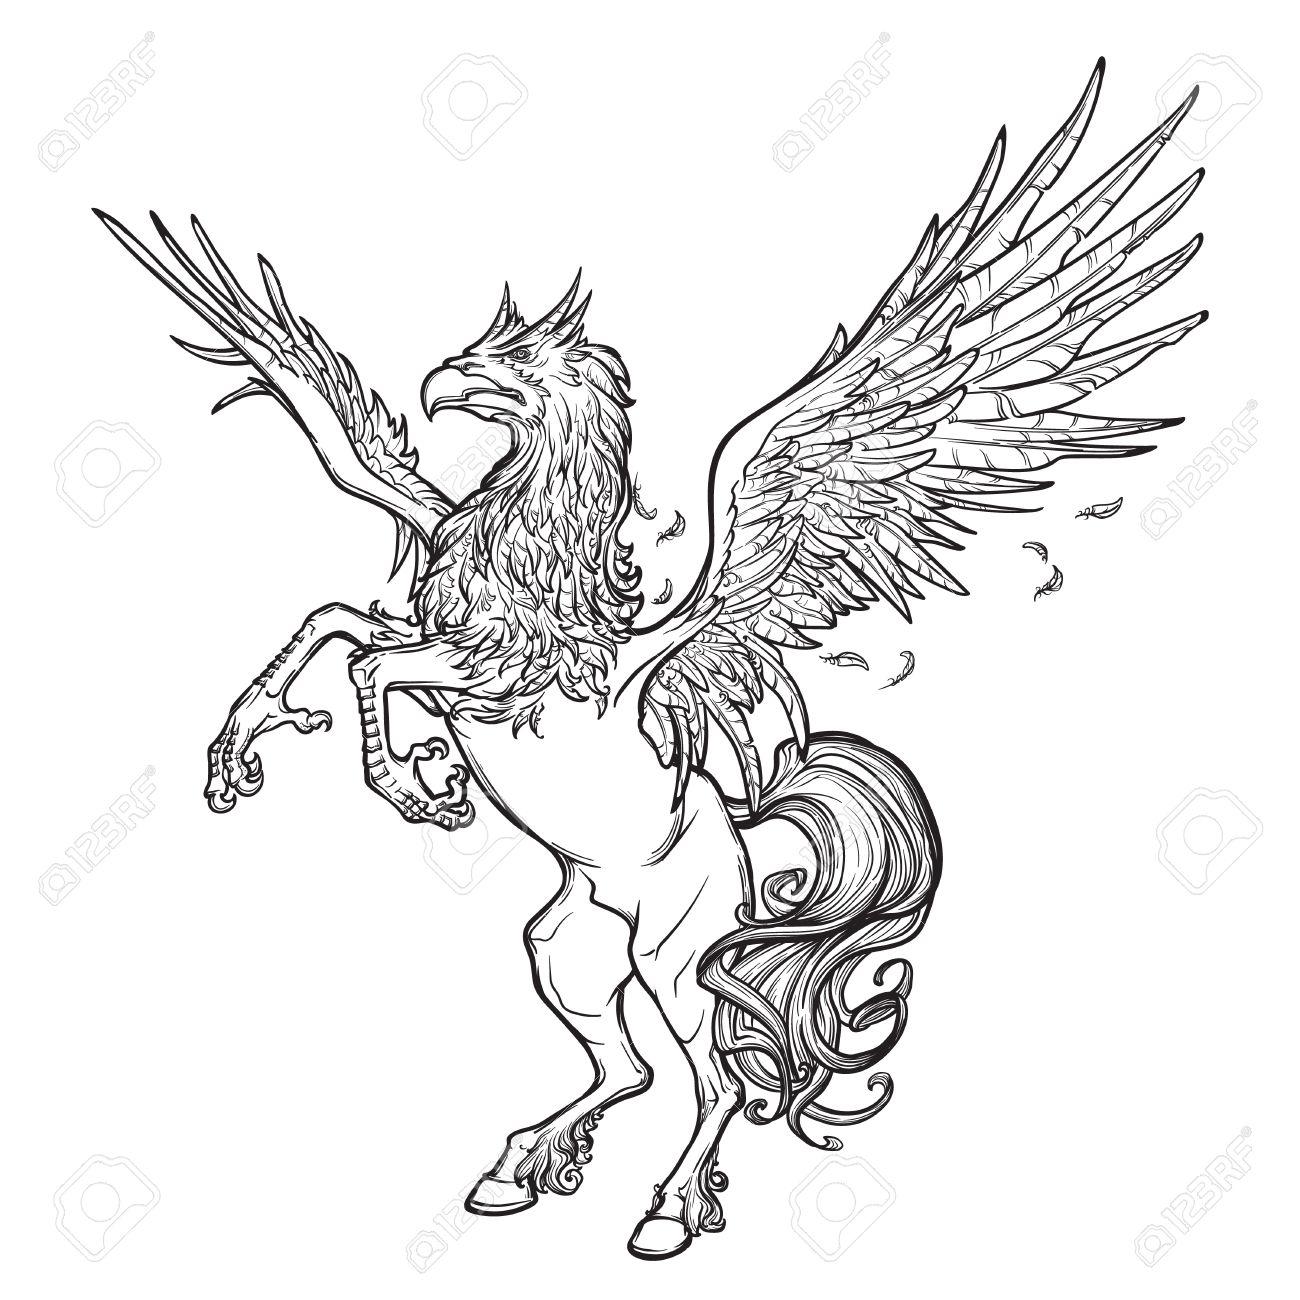 1300x1300 Hippogriff Greek Mythological Creature Legendary Beast Concept